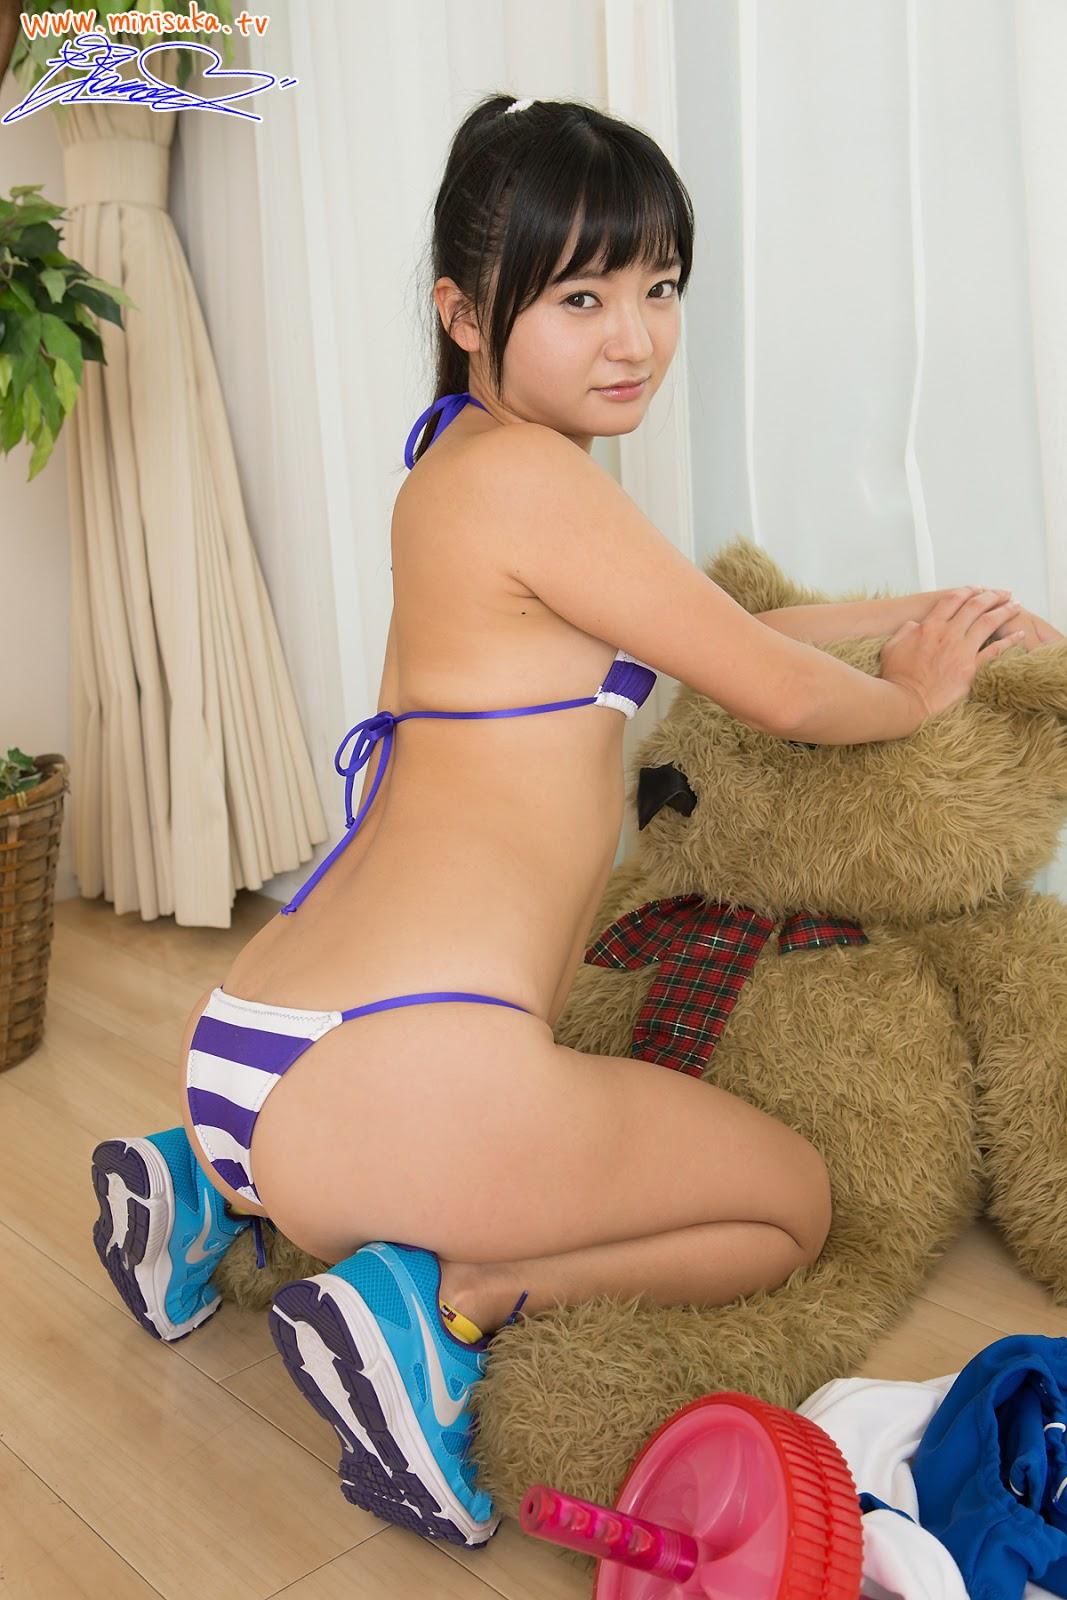 Nude Photo Forum